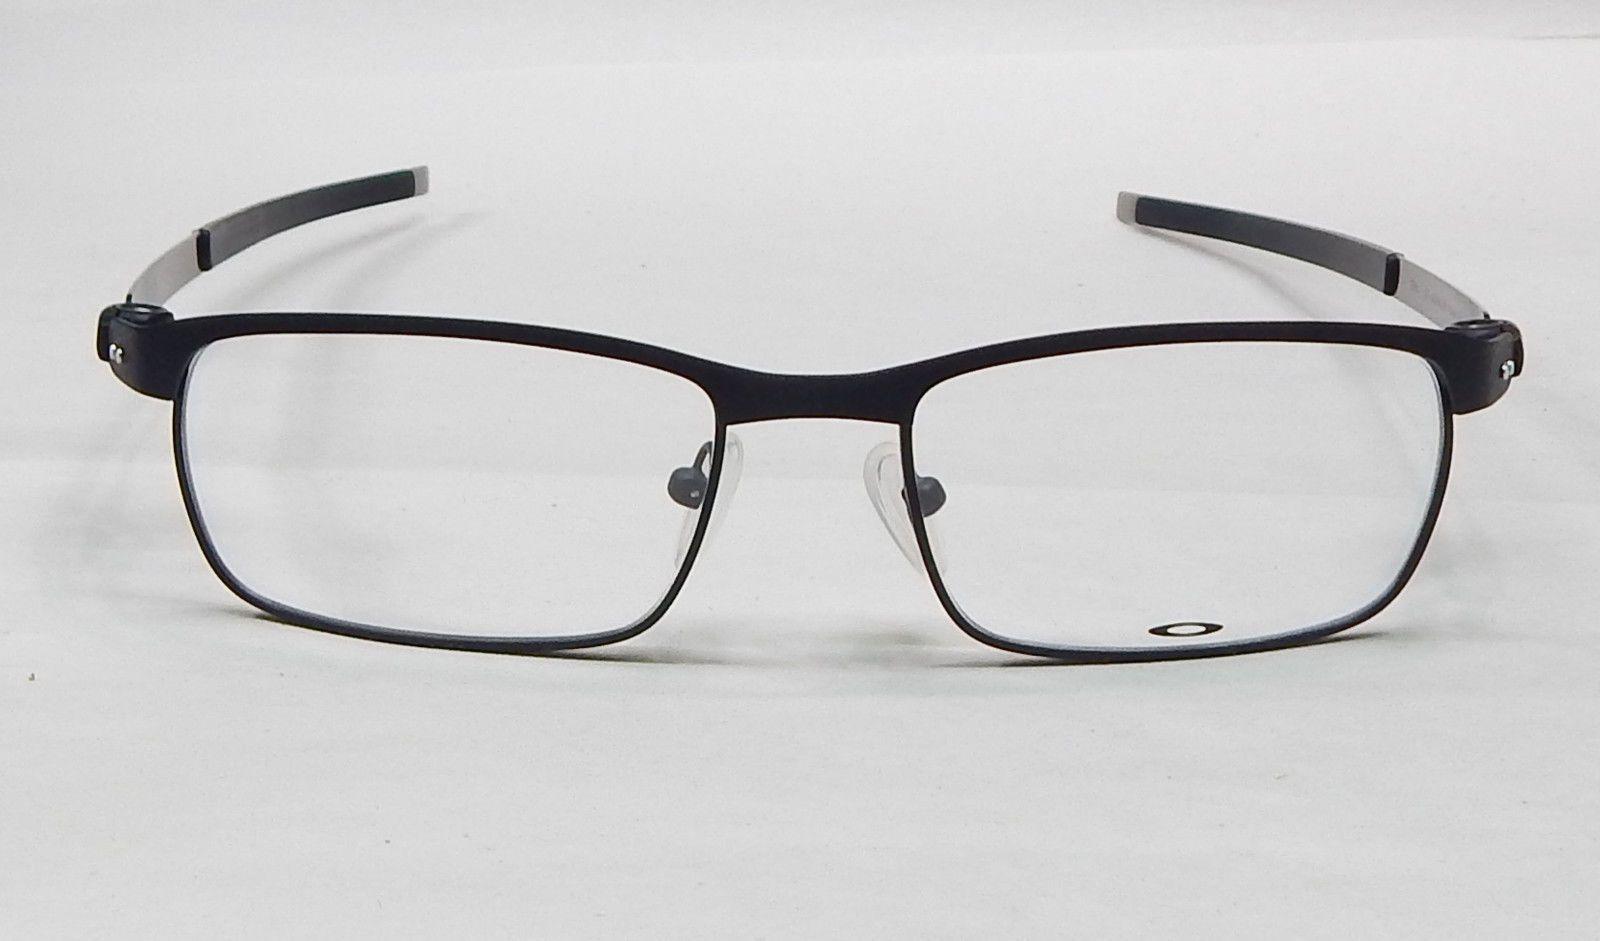 Oakley Men Prescription Eyeglasses Frame: Tincup - Power Coal - 52mm ...